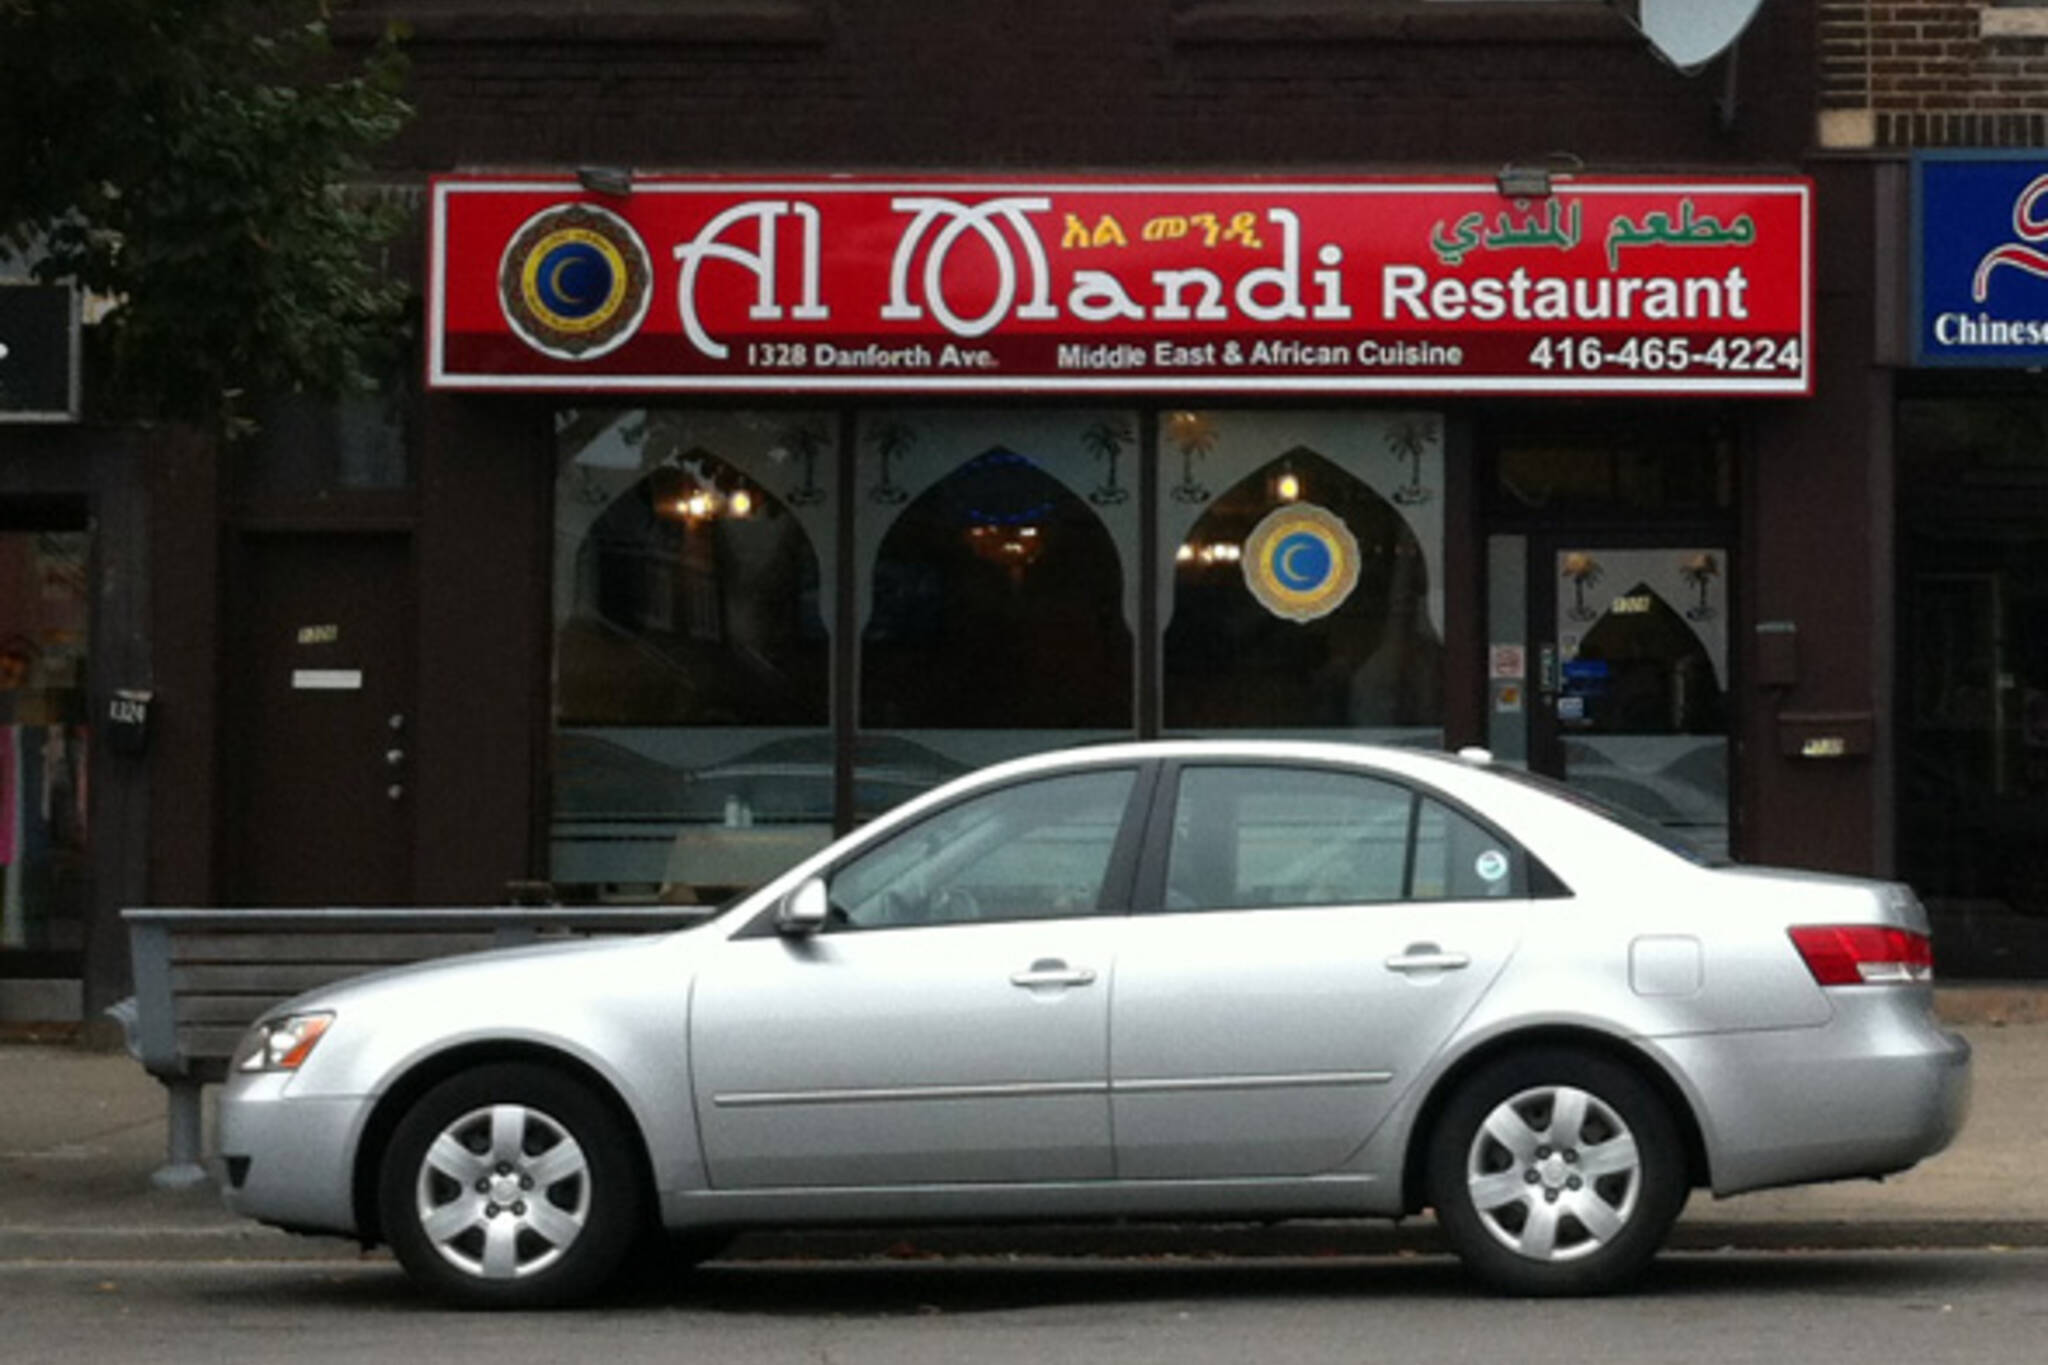 Al Mandi Restaurant